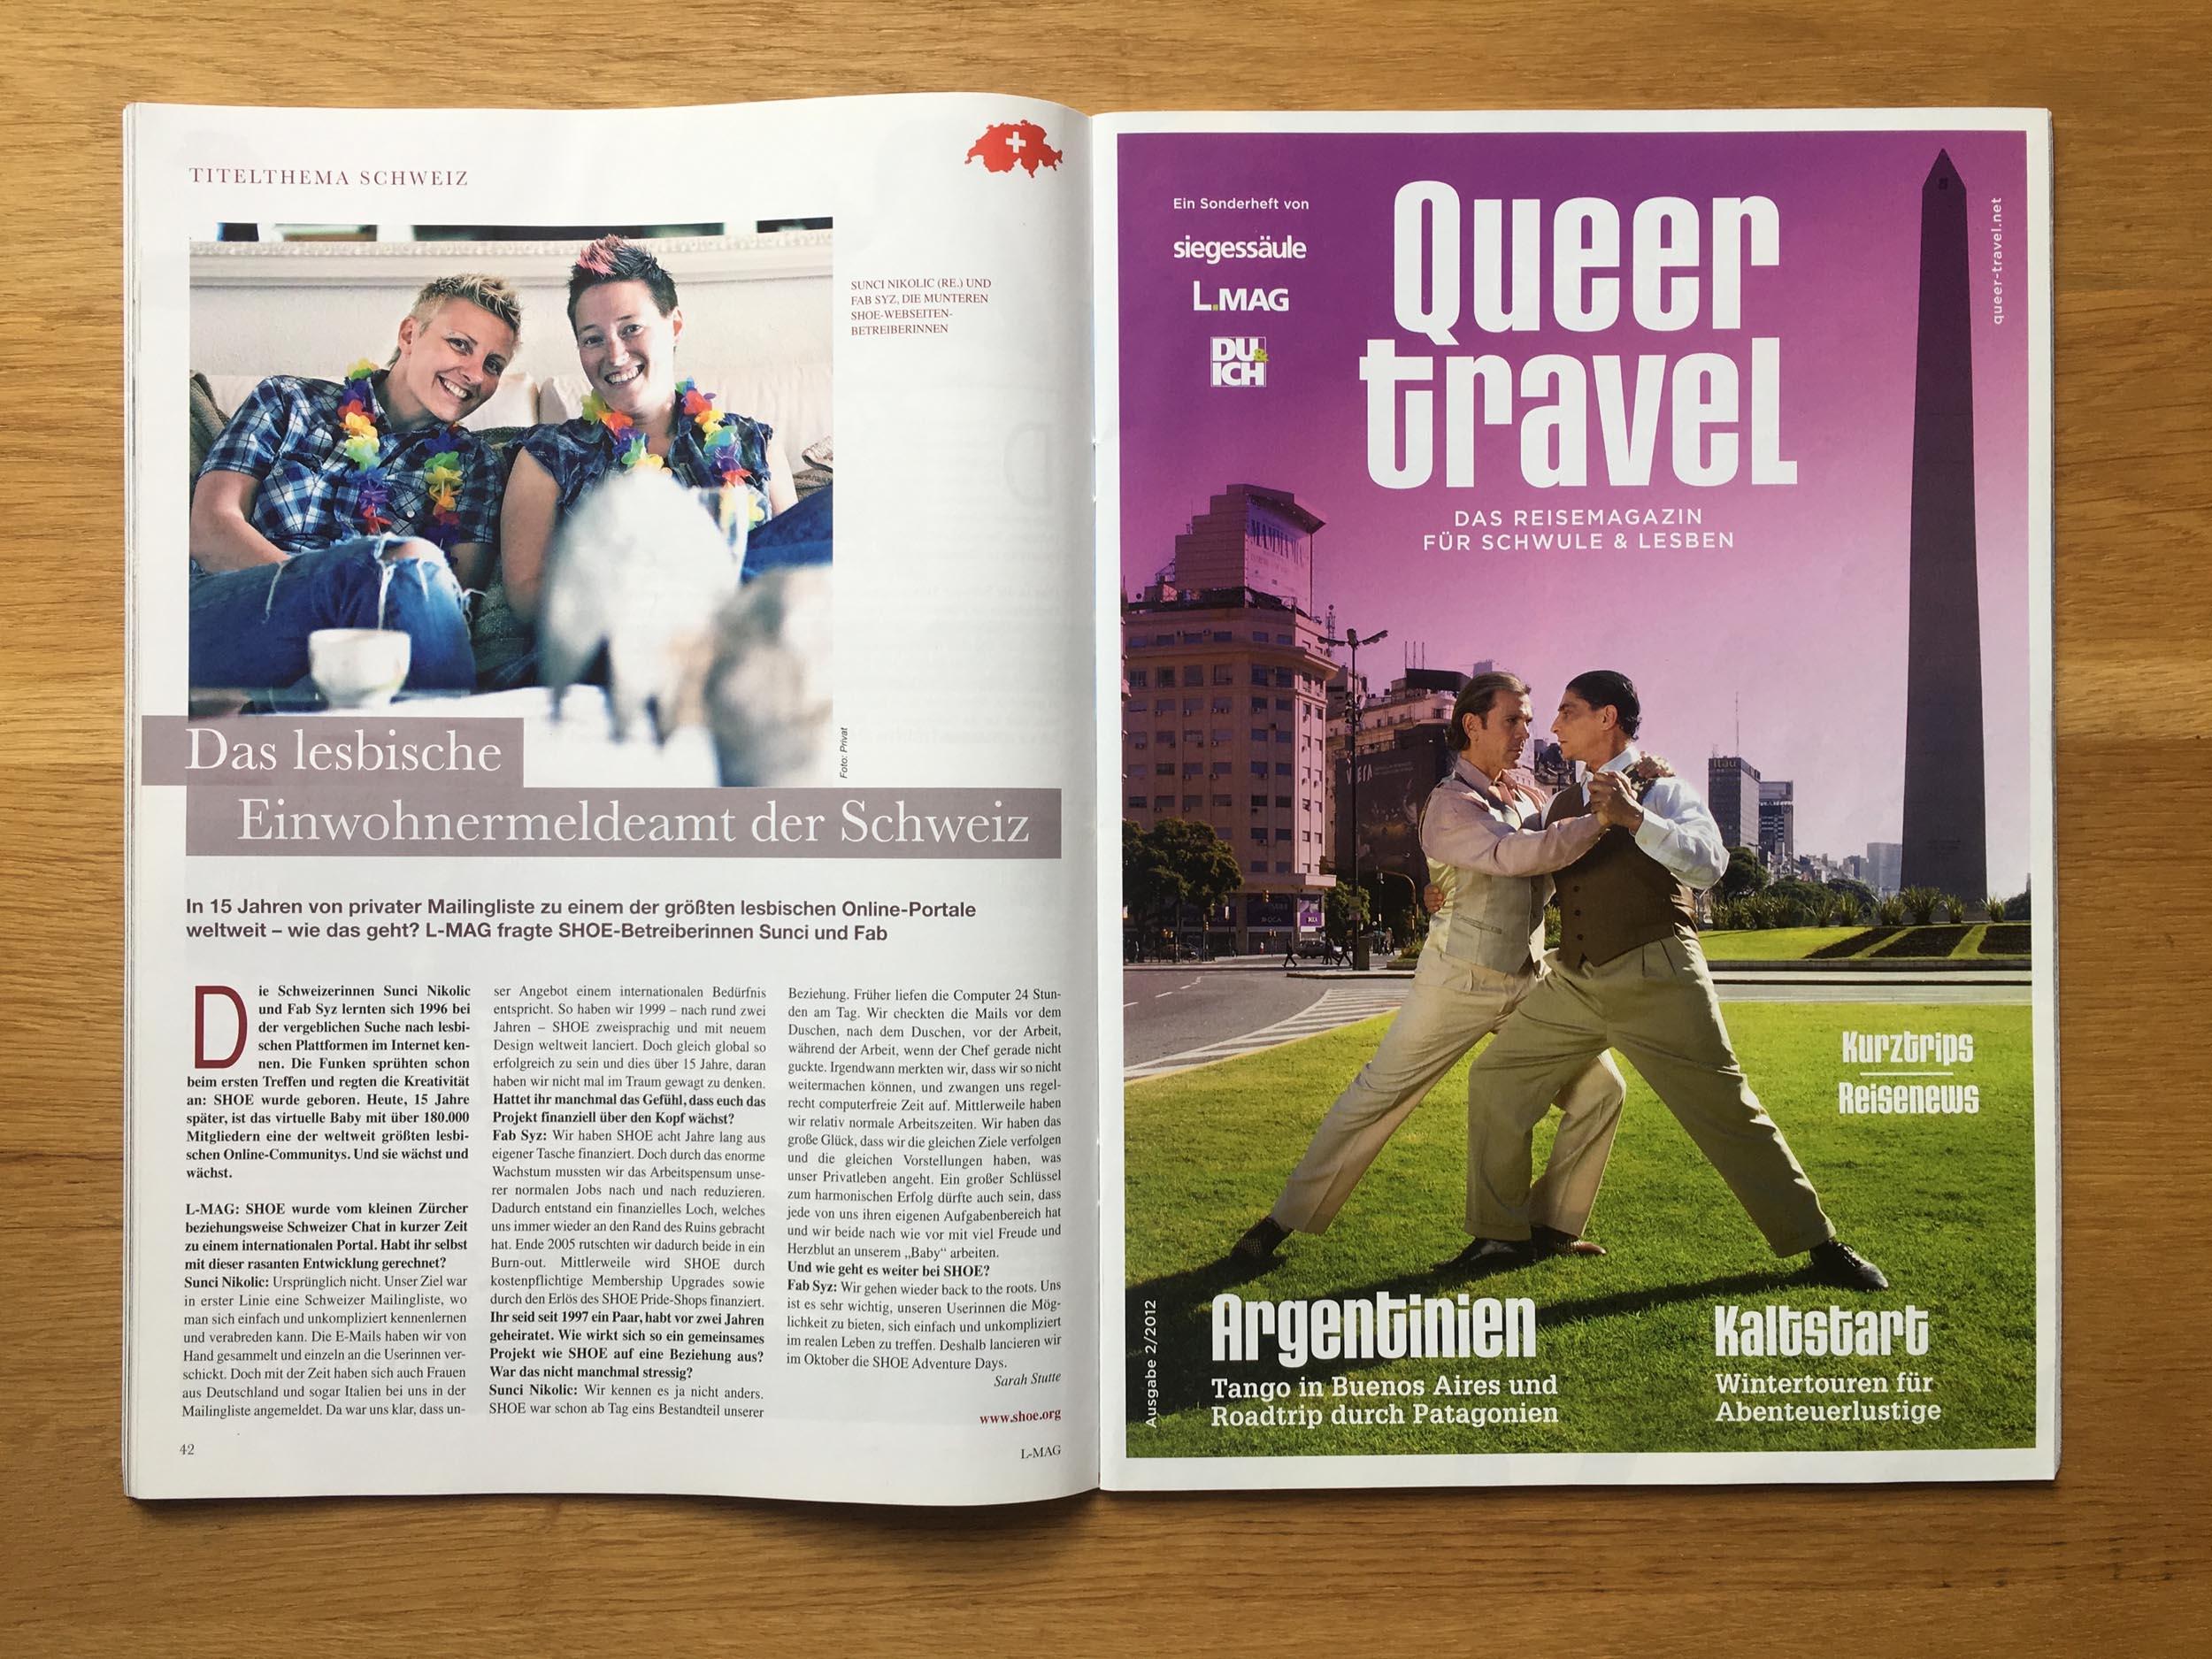 Queer Travel 2012/2